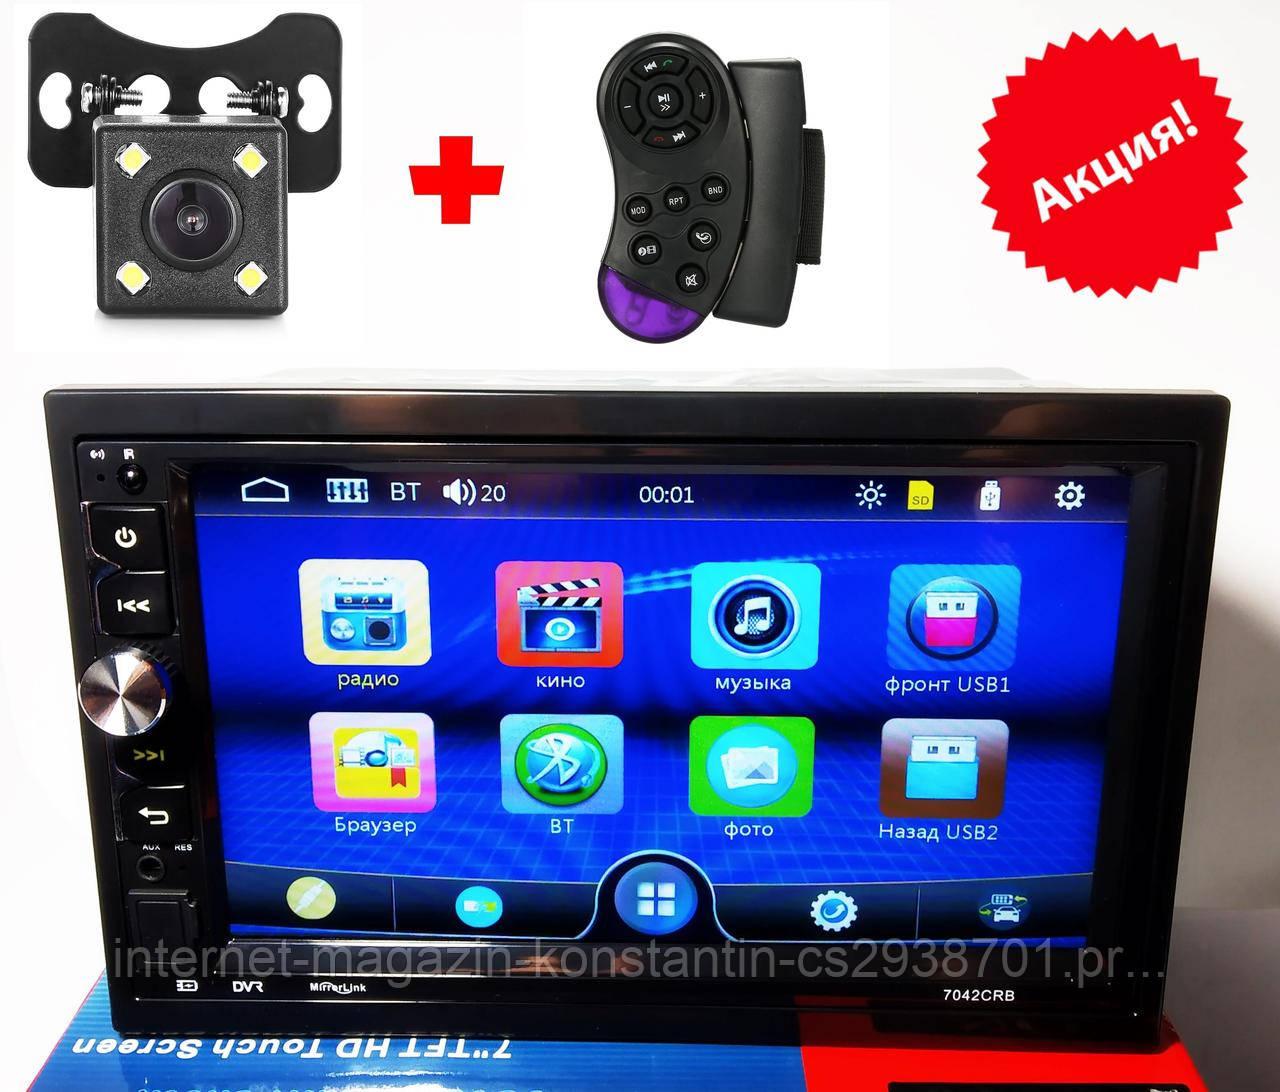 Автомагнитола 2Din Sony 7042CRB 1026*600px, USB,SD, Video + ПУЛЬТ НА РУЛЬ